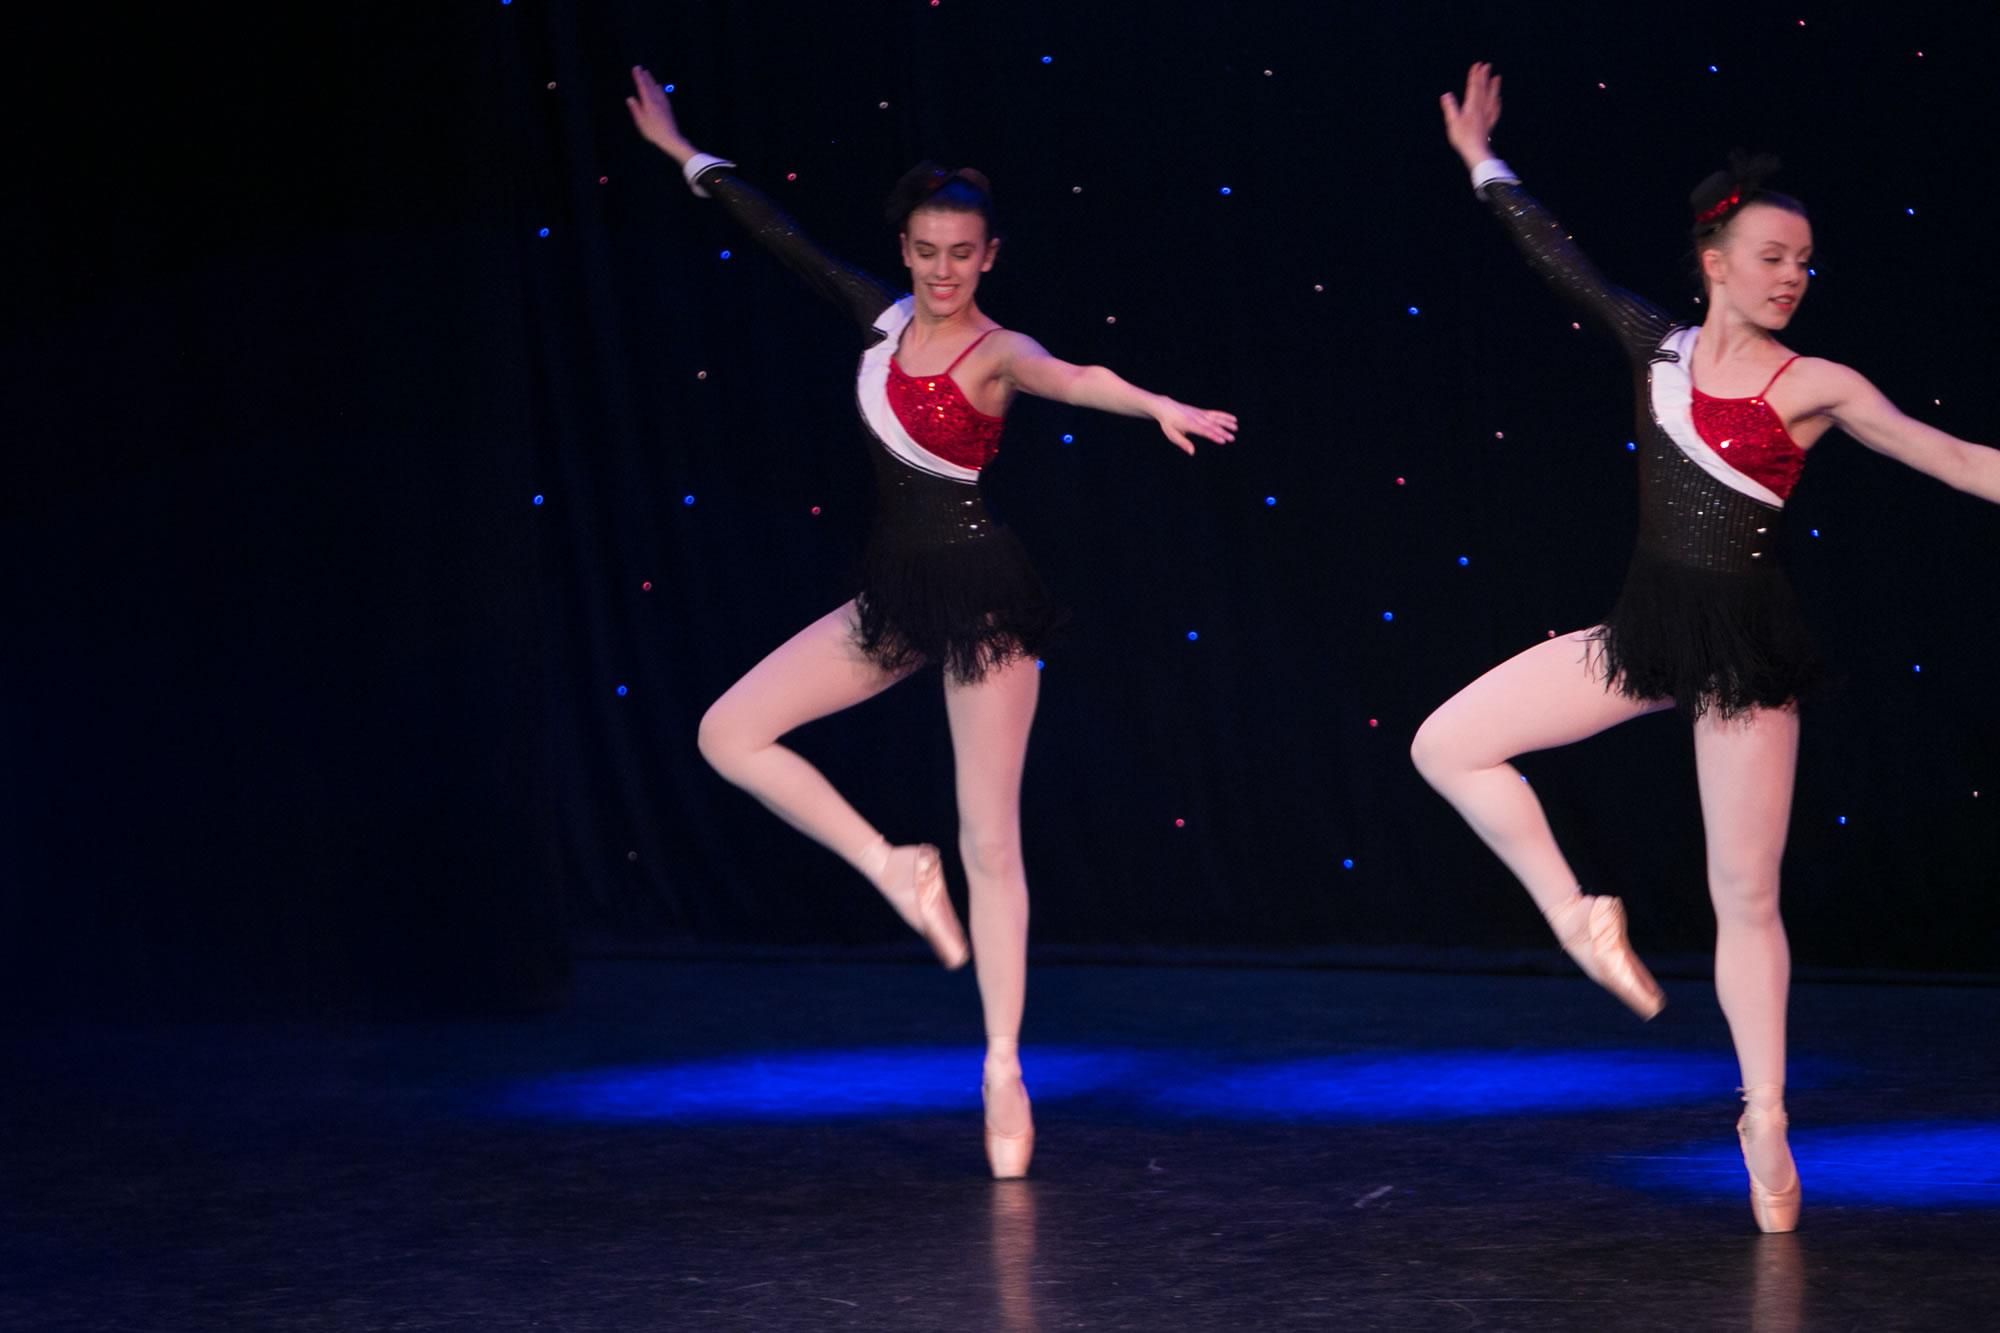 Hitchin_School_of_Dance_Show_2019-SM1_3211.jpg